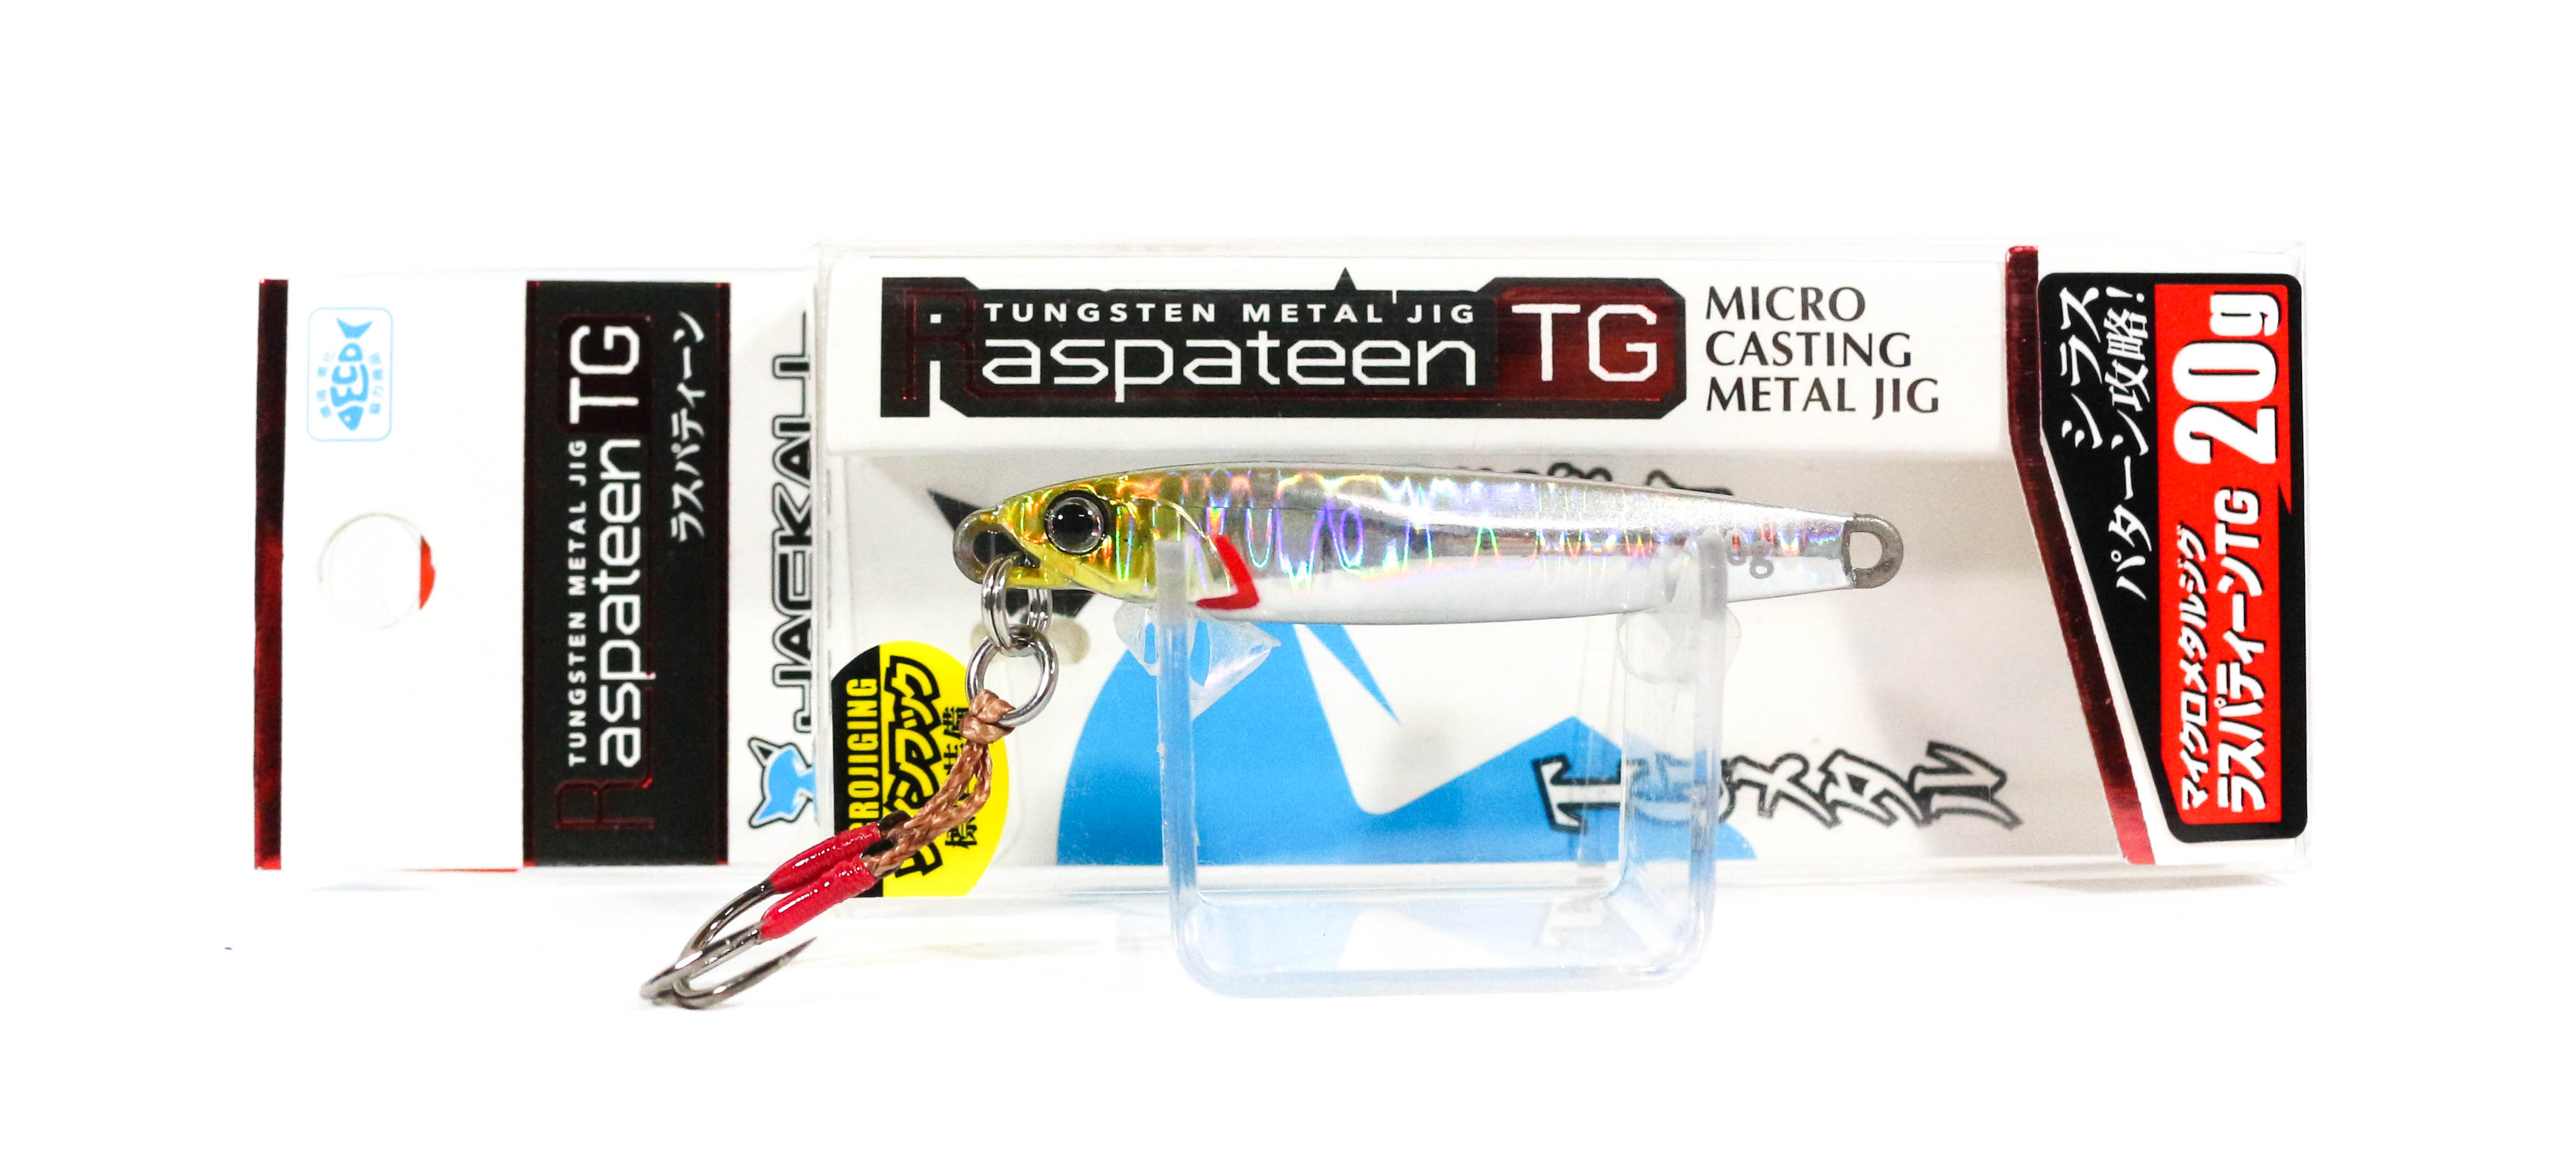 Jackall Metal Jig Raspateen TG Tungsten 20 grams Shirasu Silver (3615)